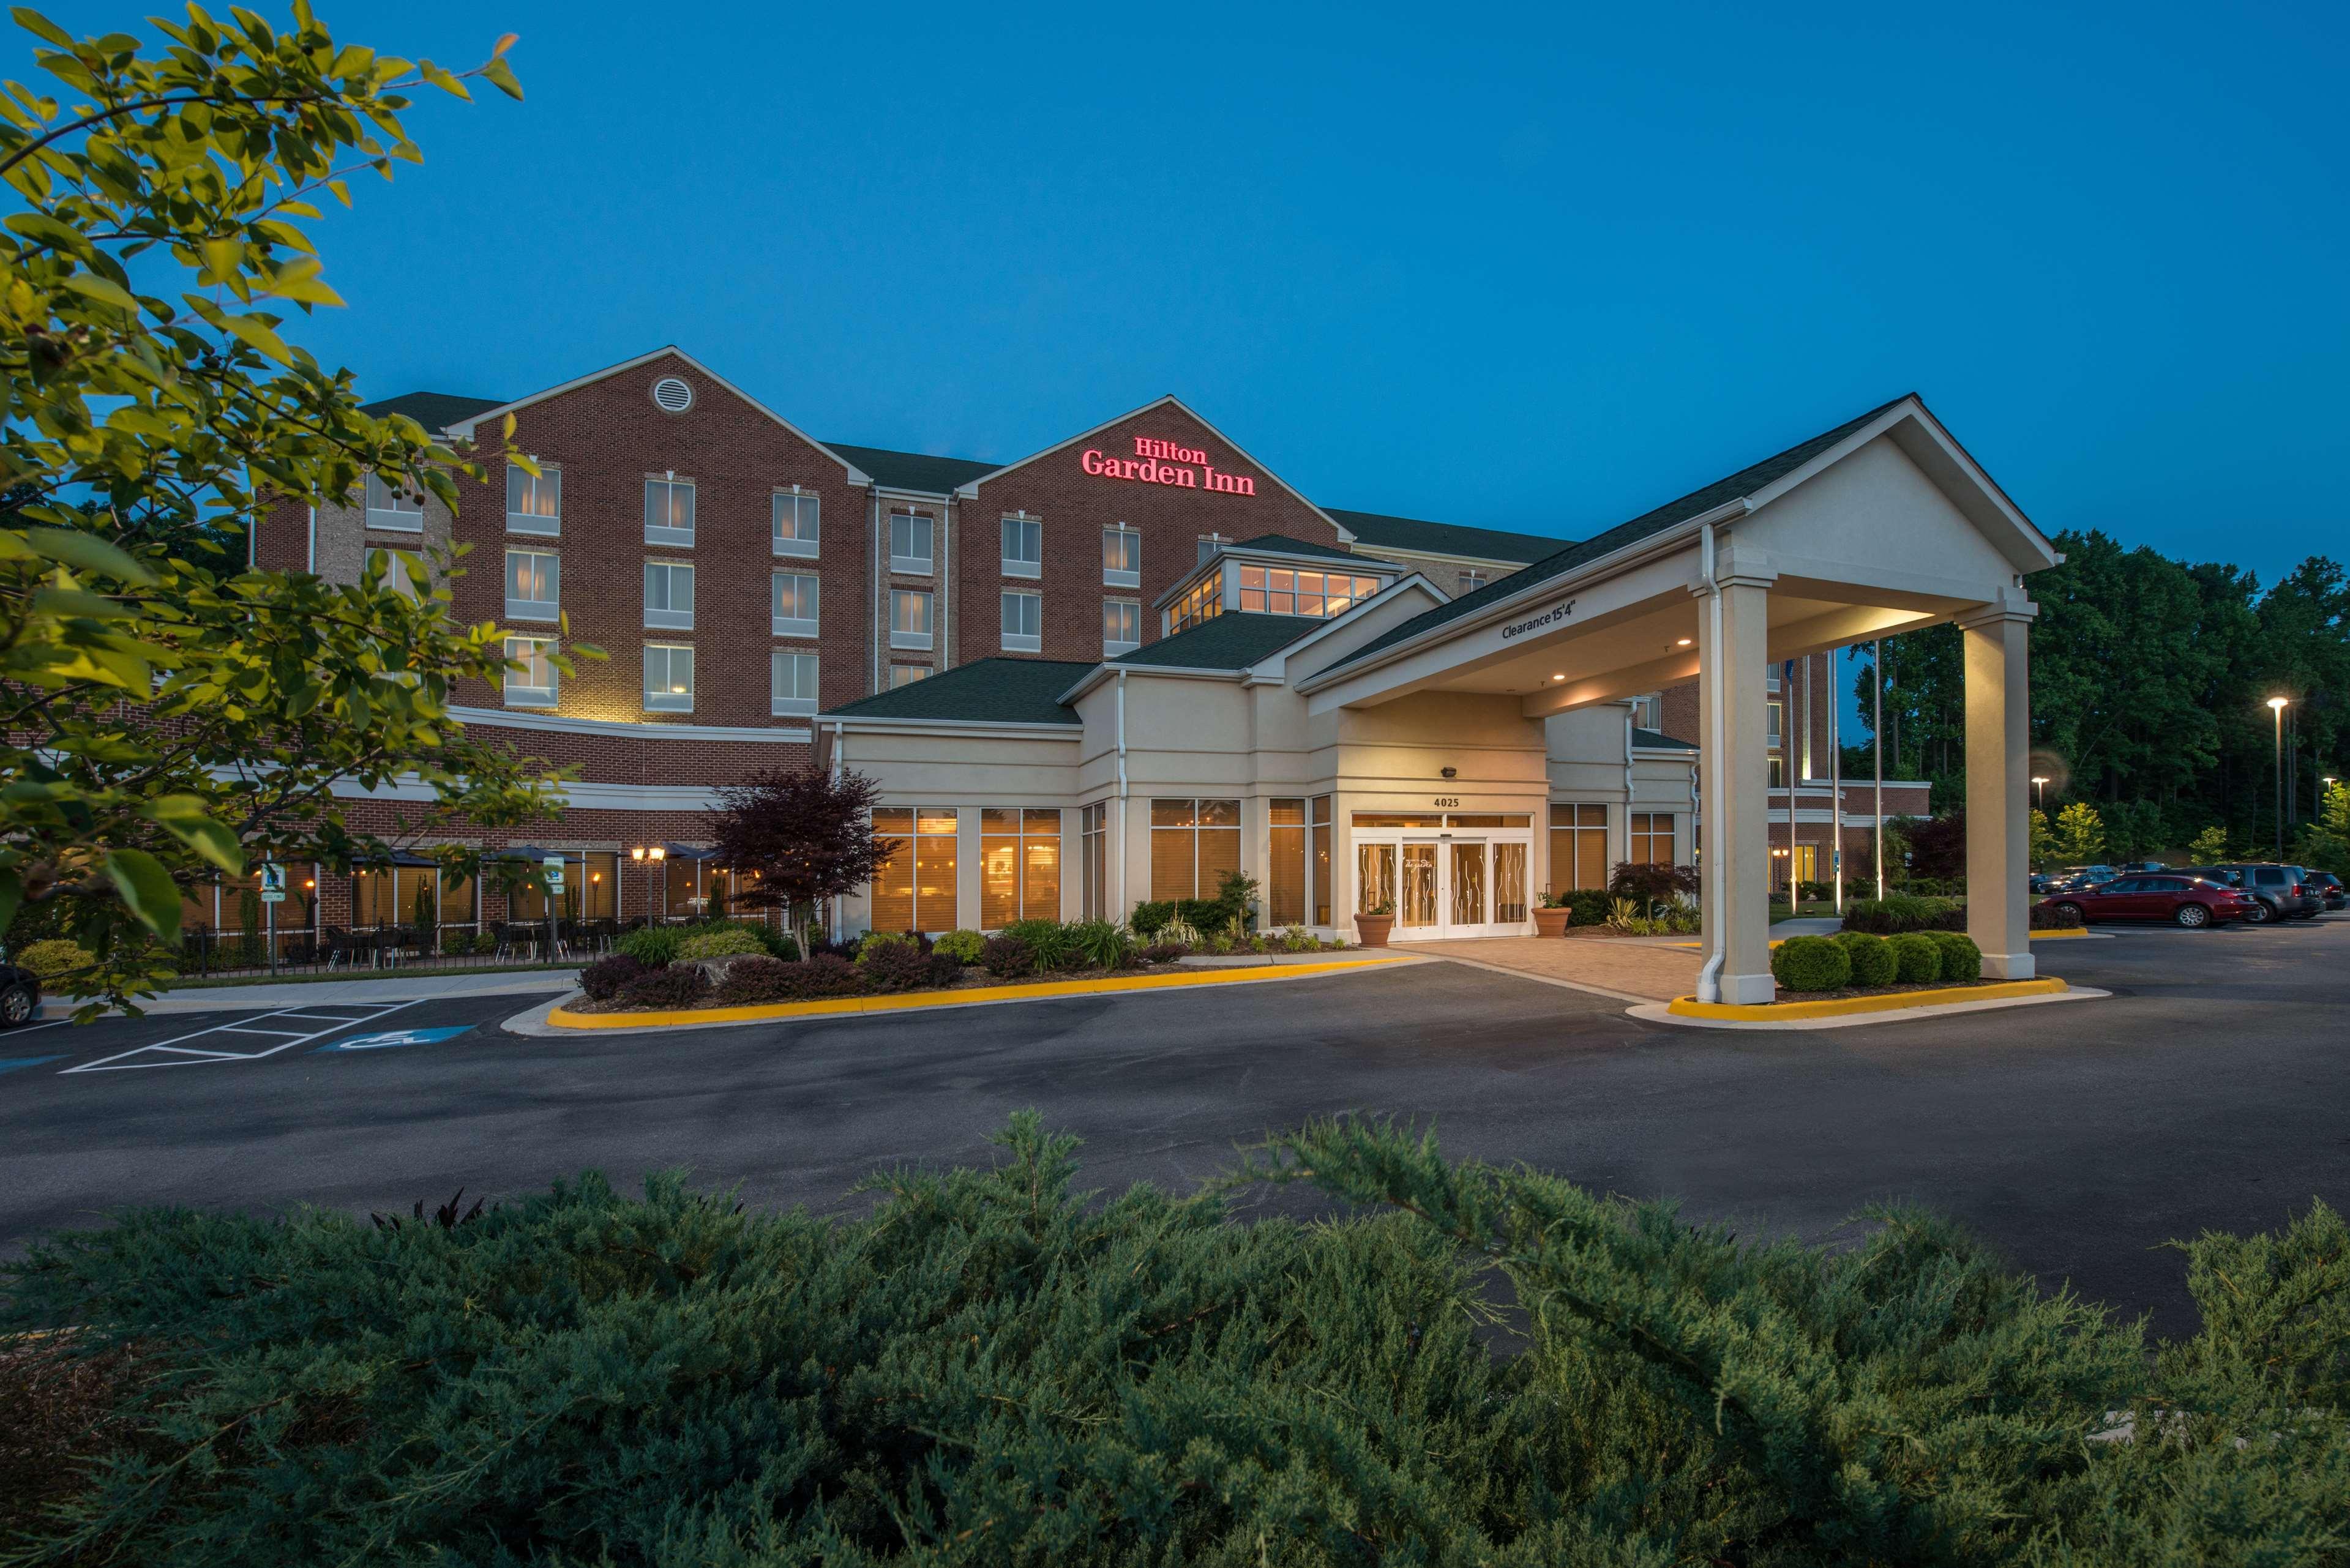 Hilton Garden Inn Lynchburg image 0